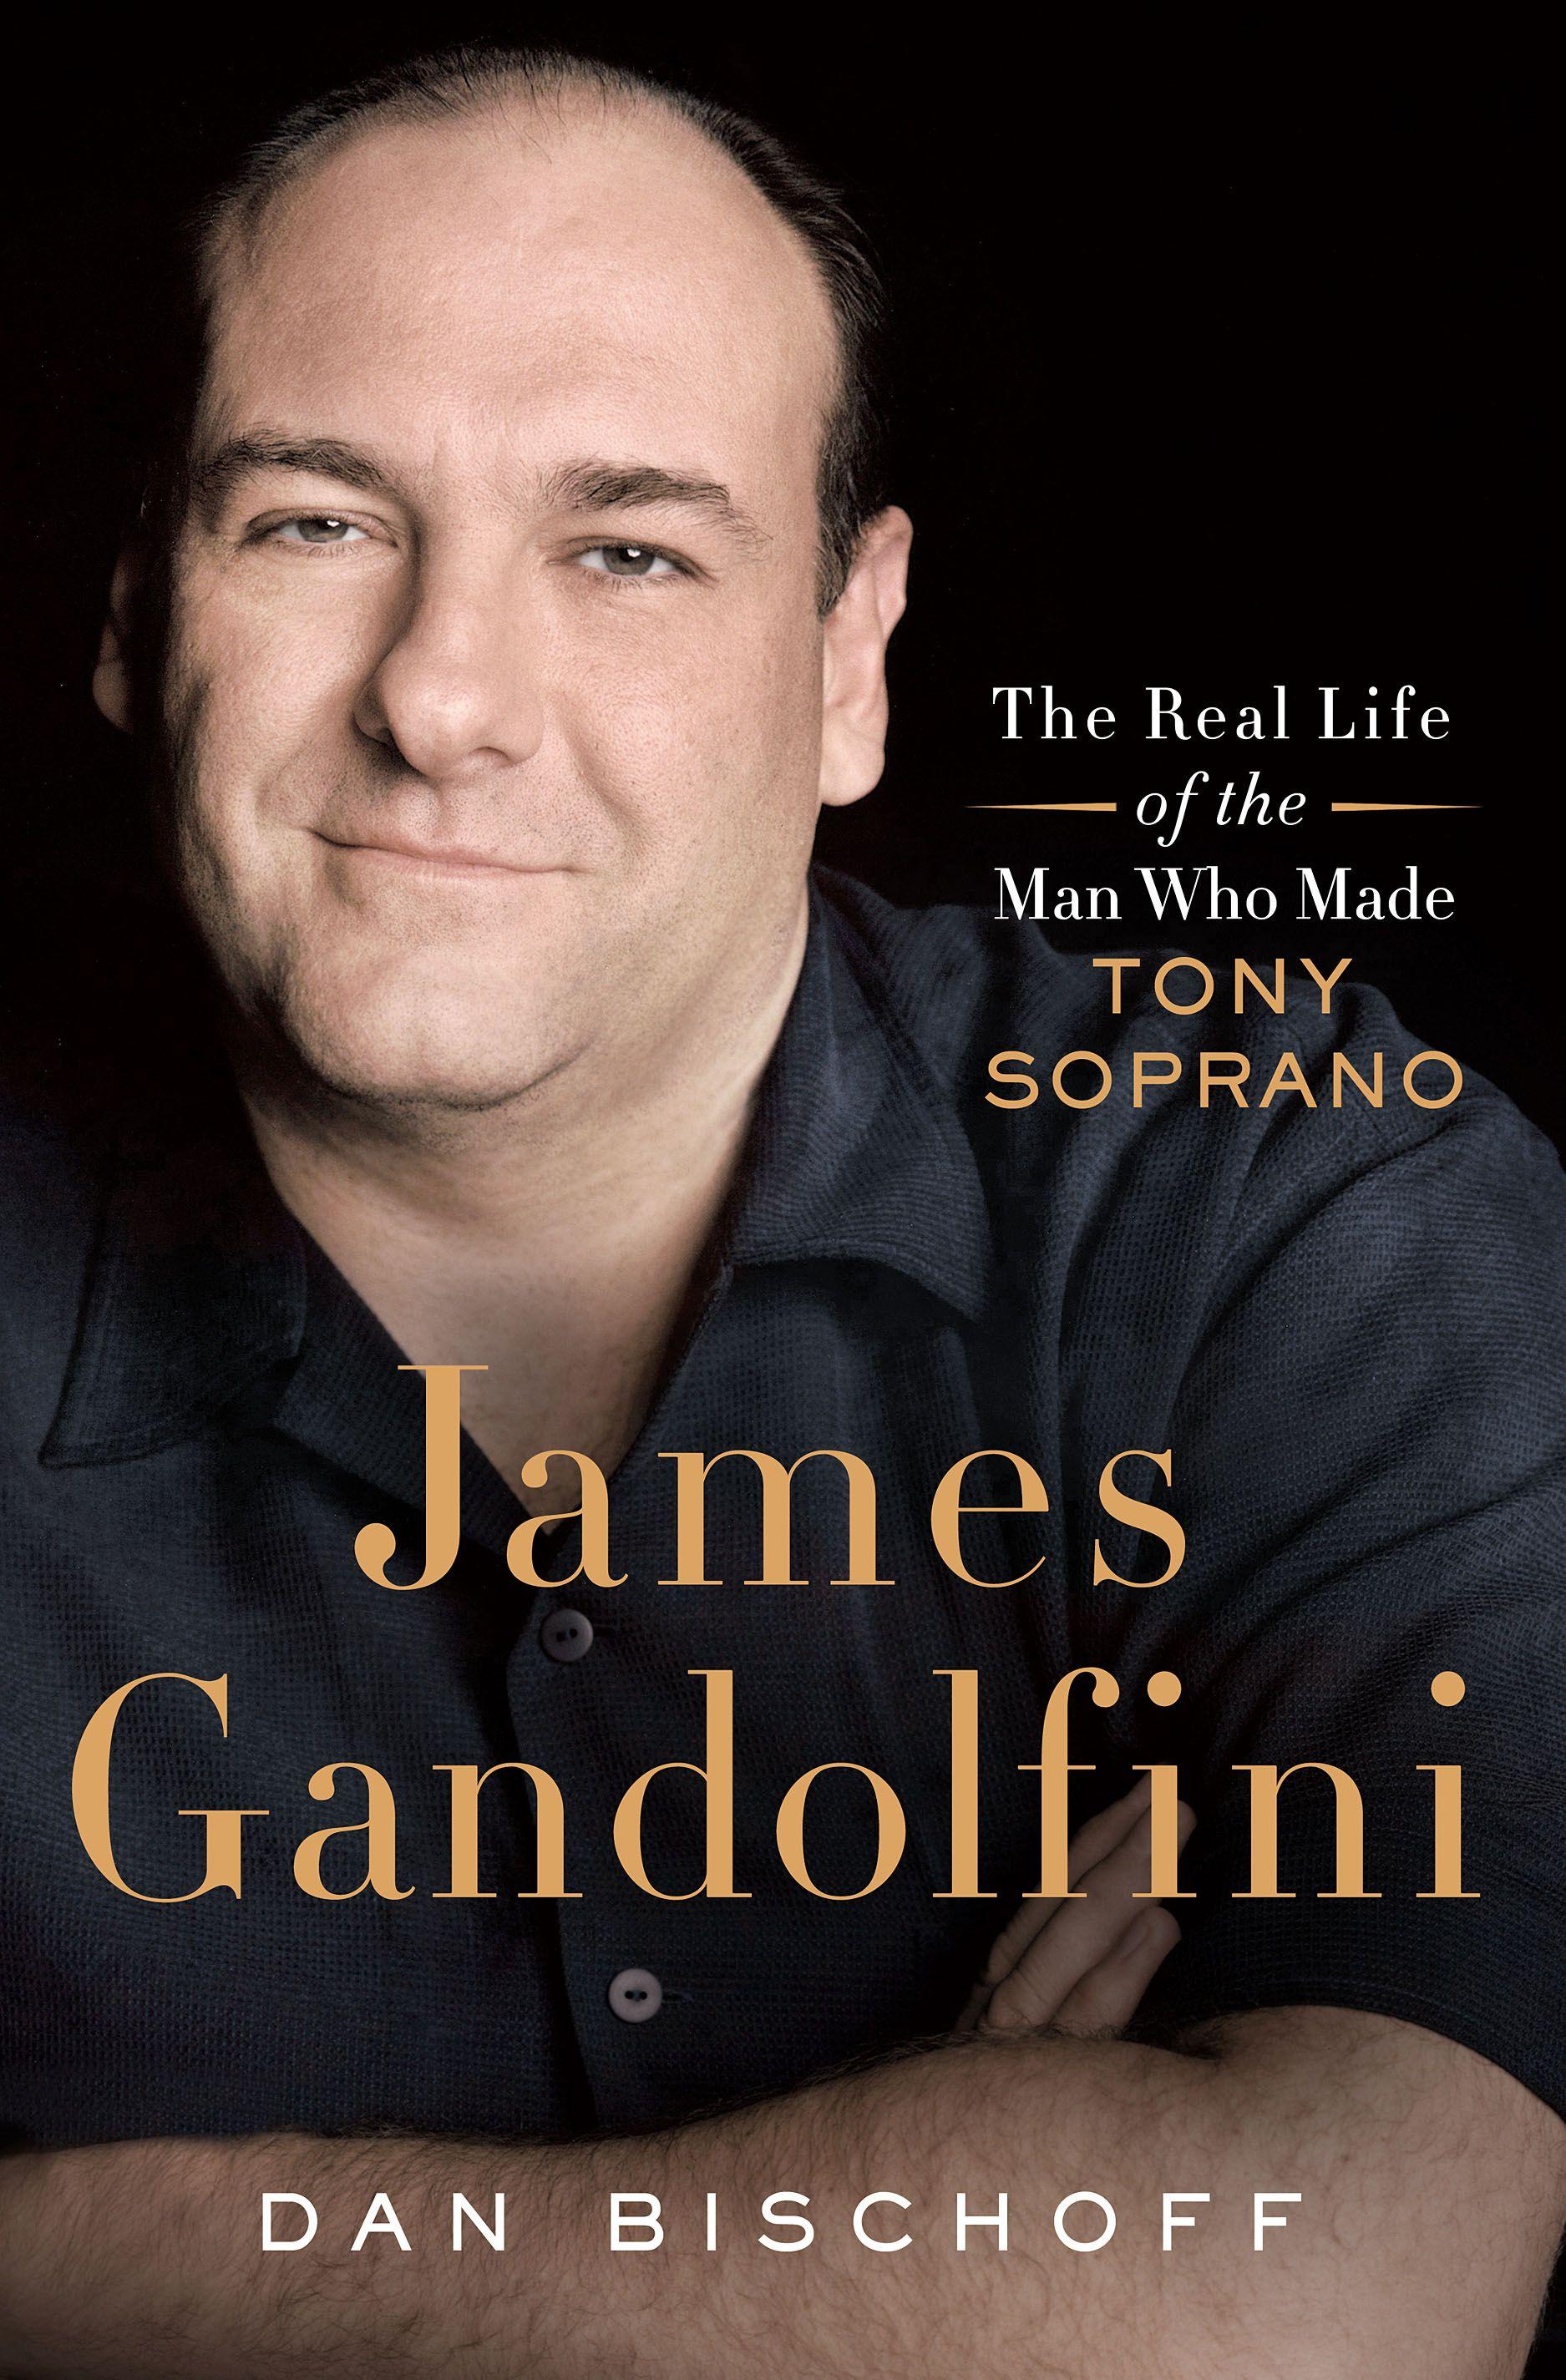 Biography of James Gandolfini completed